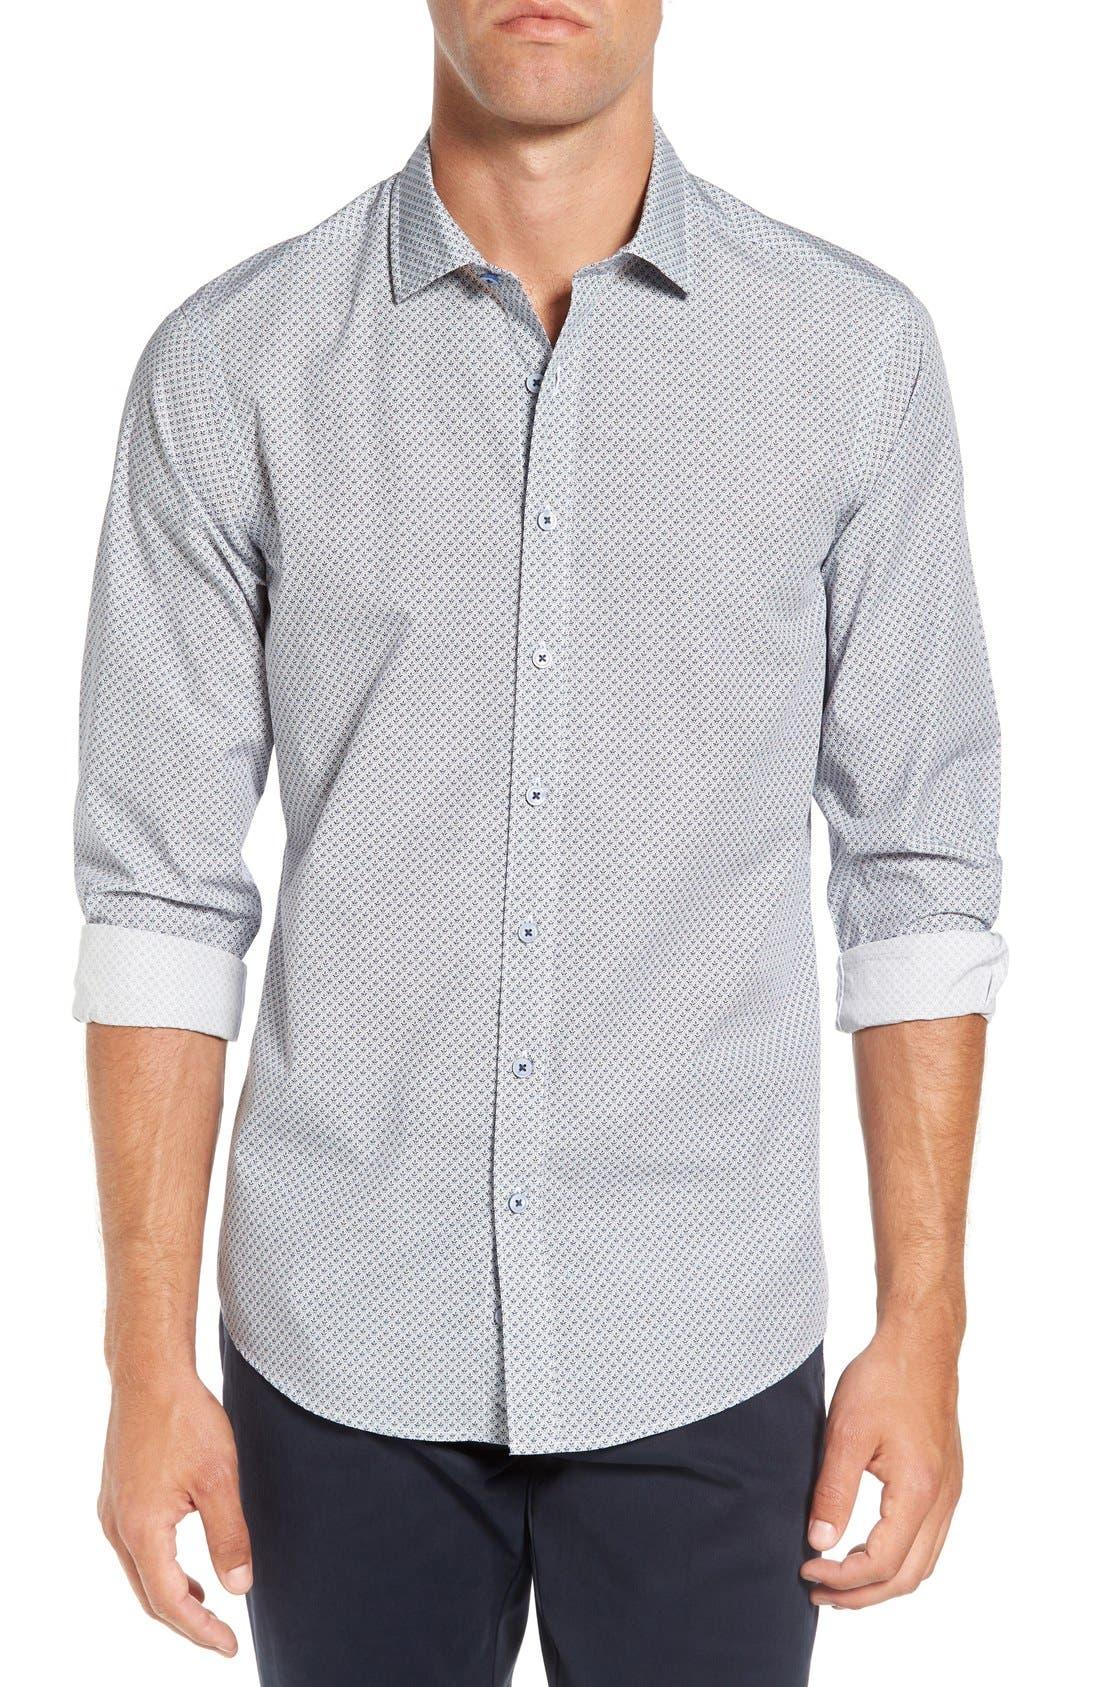 Image of RODD AND GUNN Chadlington Sports Fit Dress Shirt